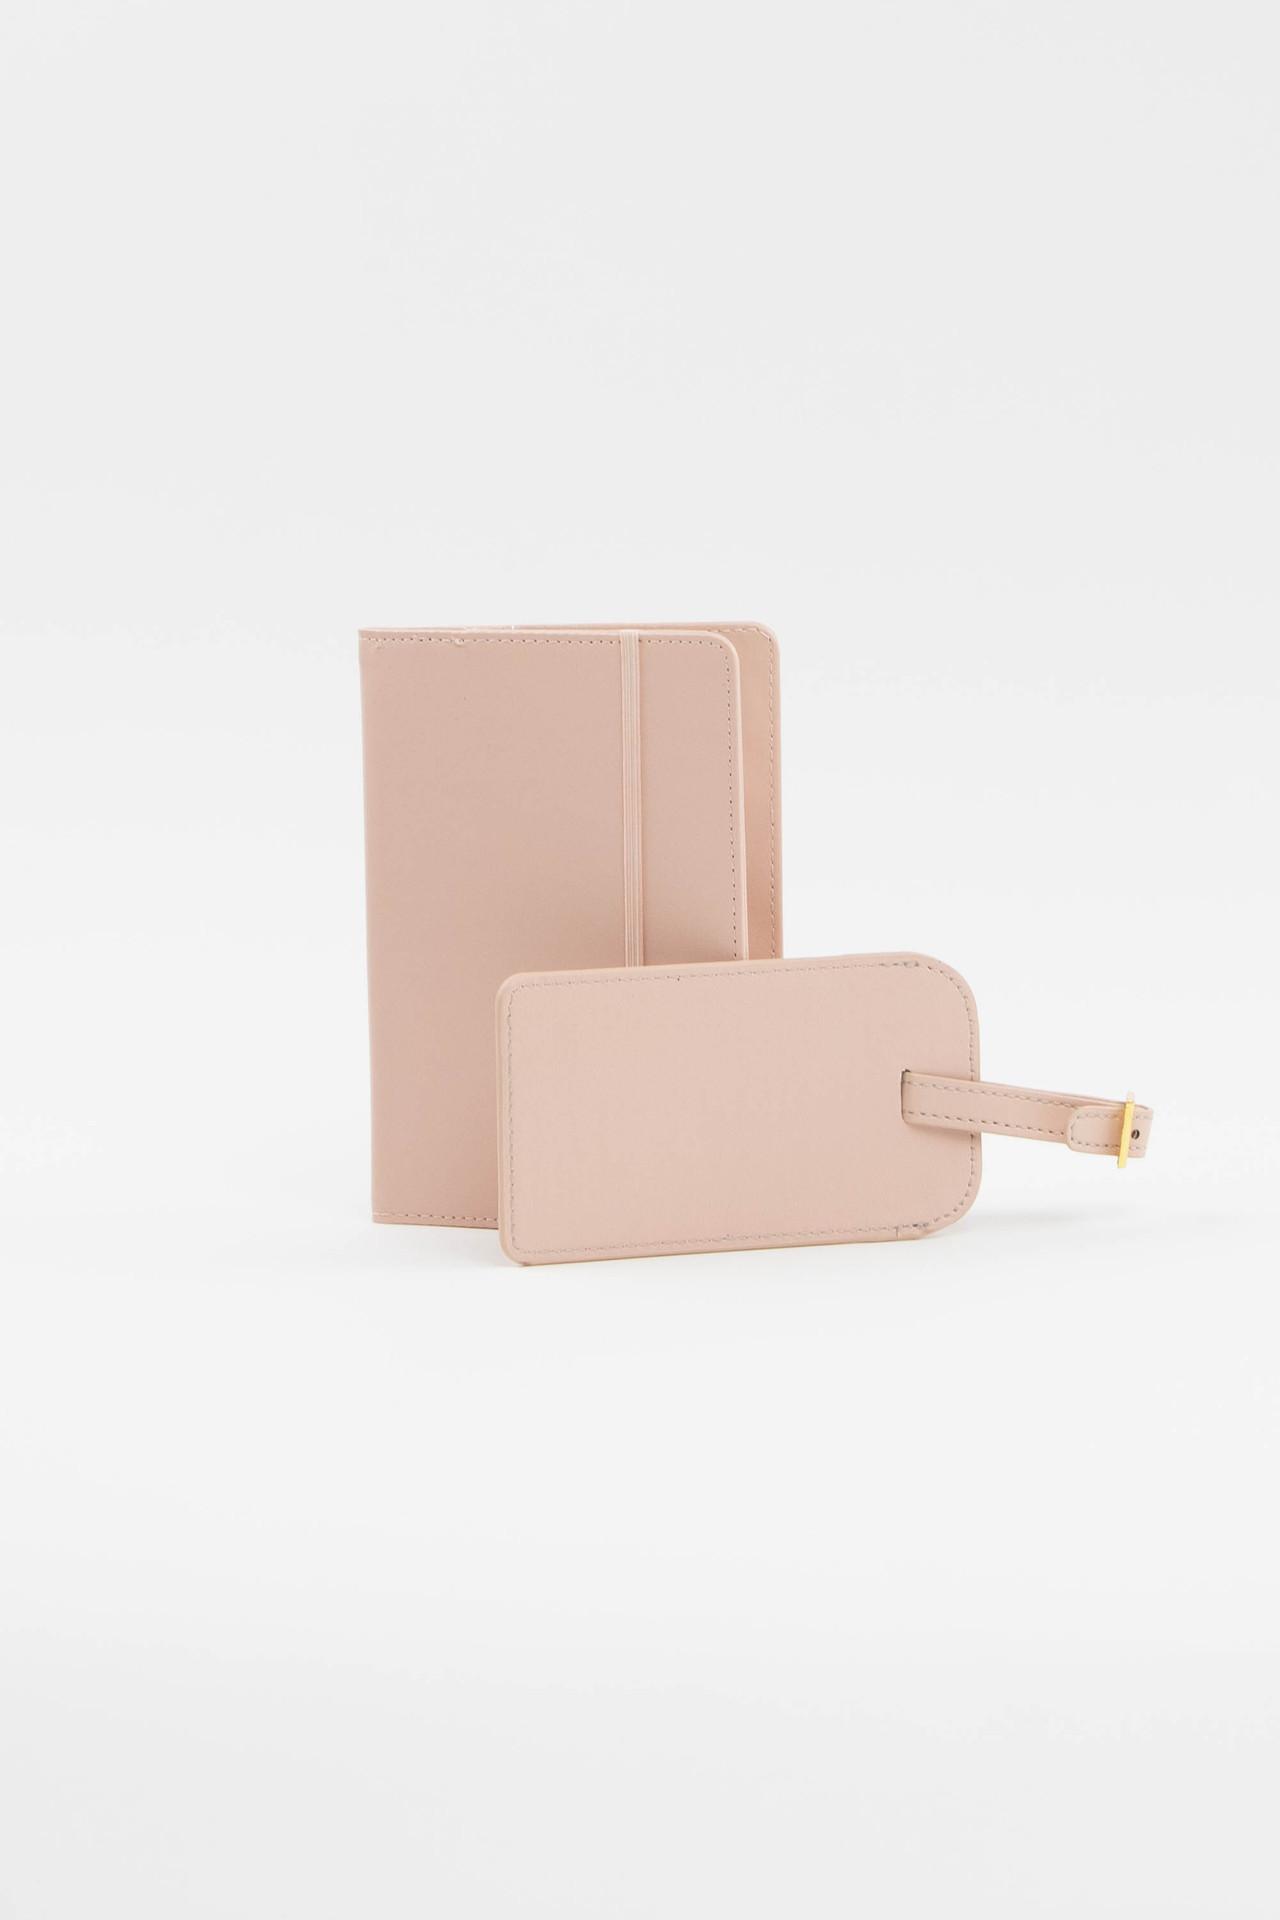 Blush Luggage Tag + Passport Holder